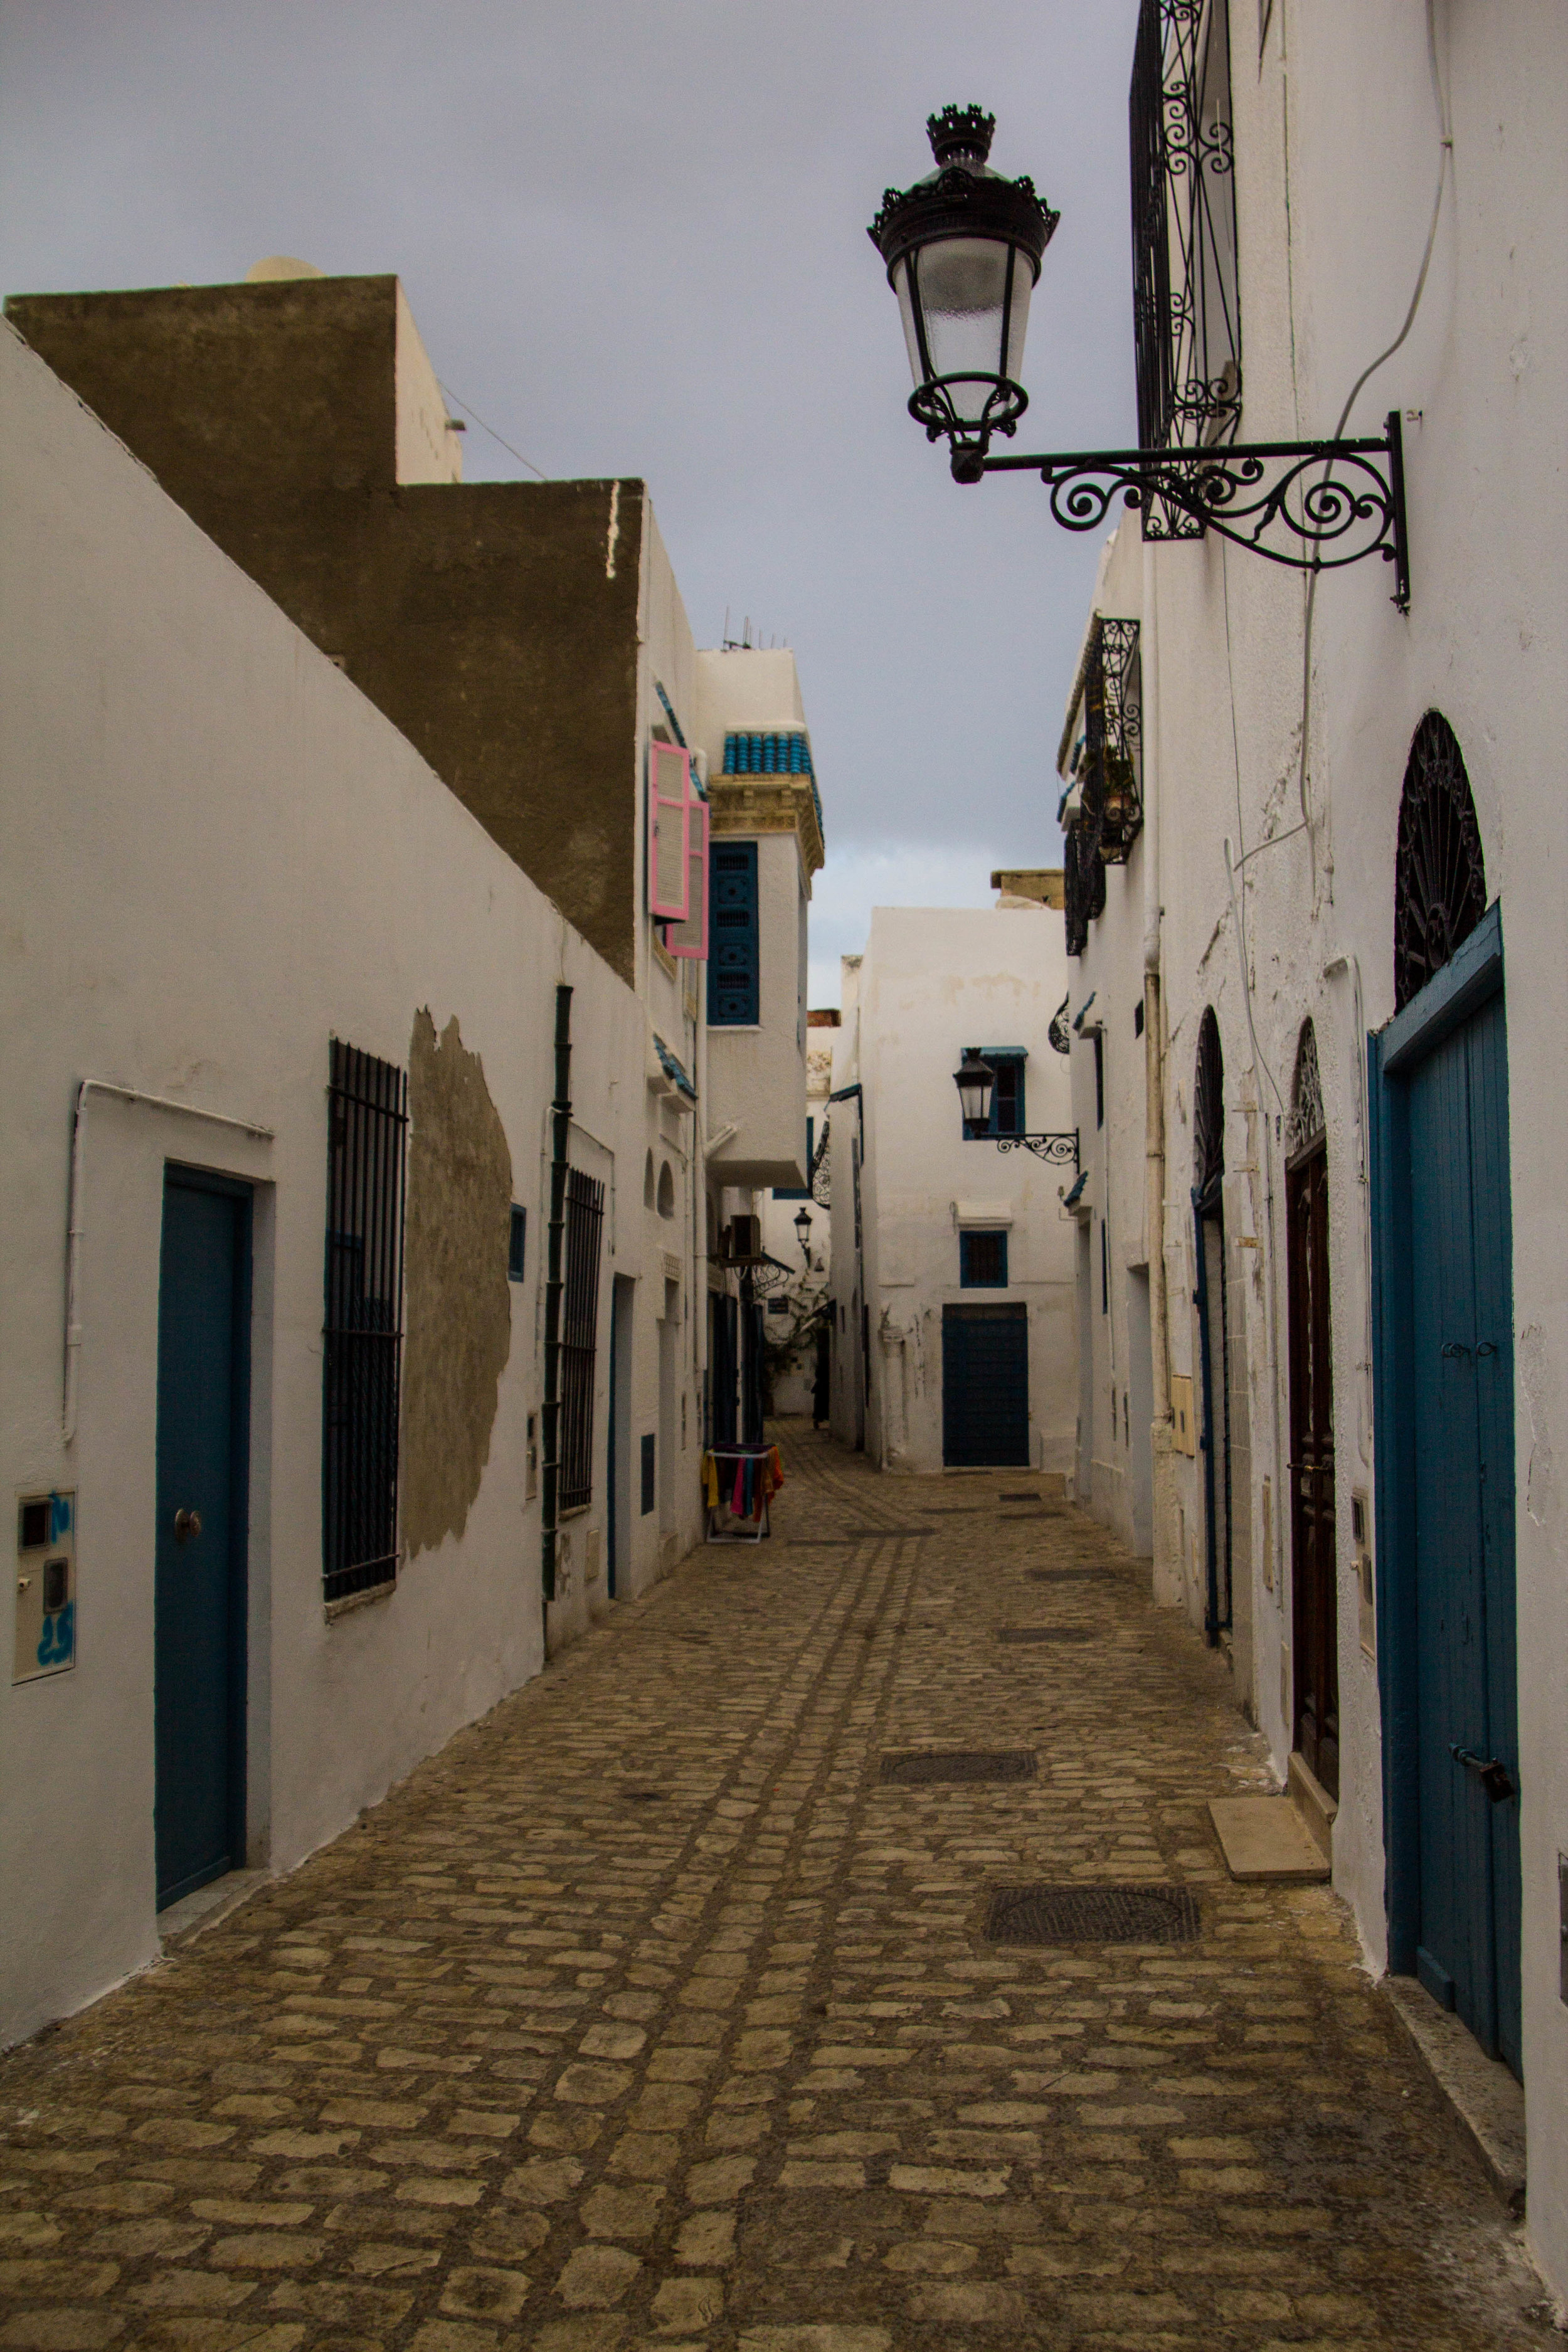 medina-photography-tunis-tunisia-44.jpg